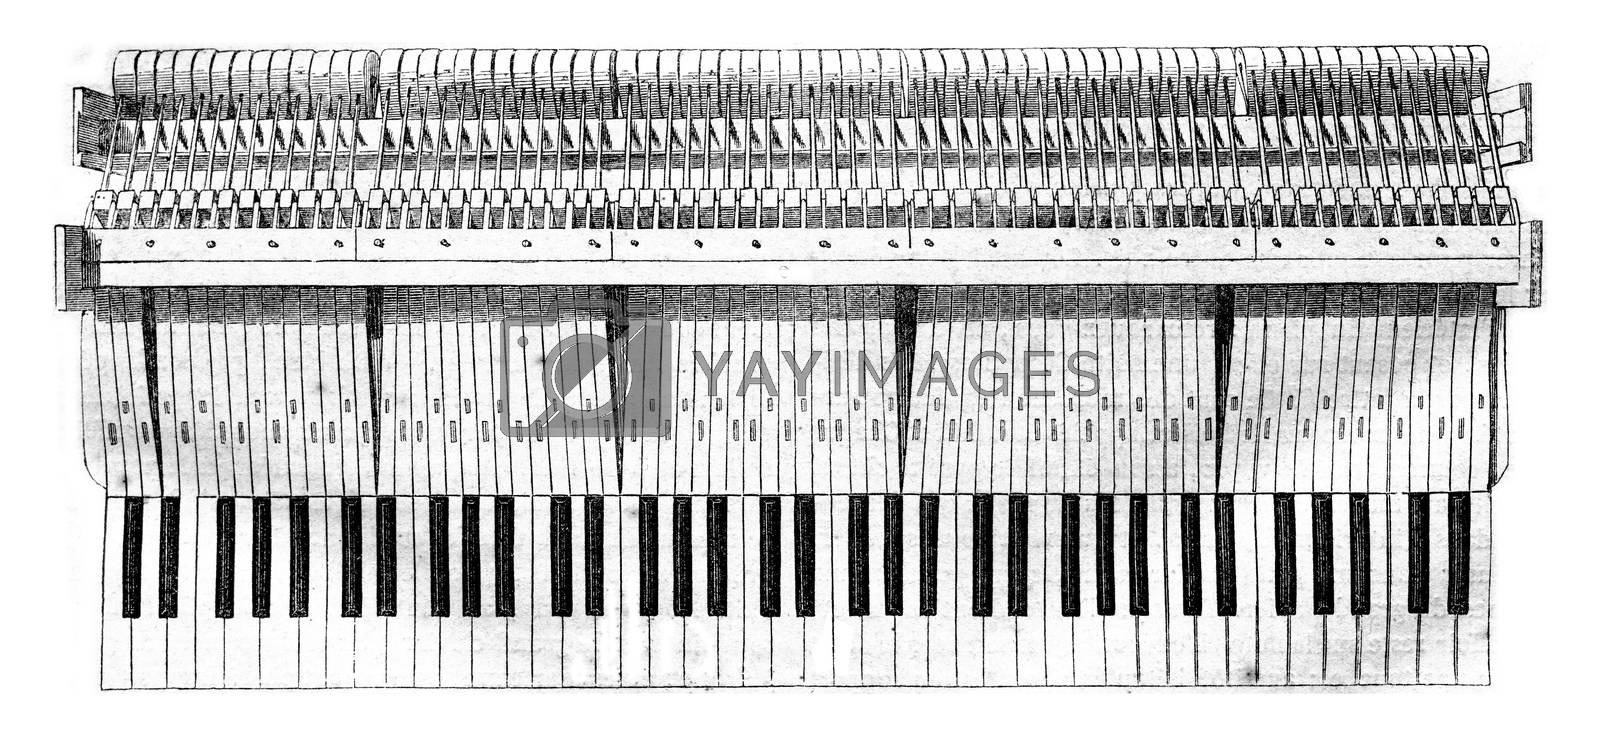 Keys, Head of the hammer, Hammer handle, Hammer nuts, Barre hammers, vintage engraved illustration. Magasin Pittoresque 1844.